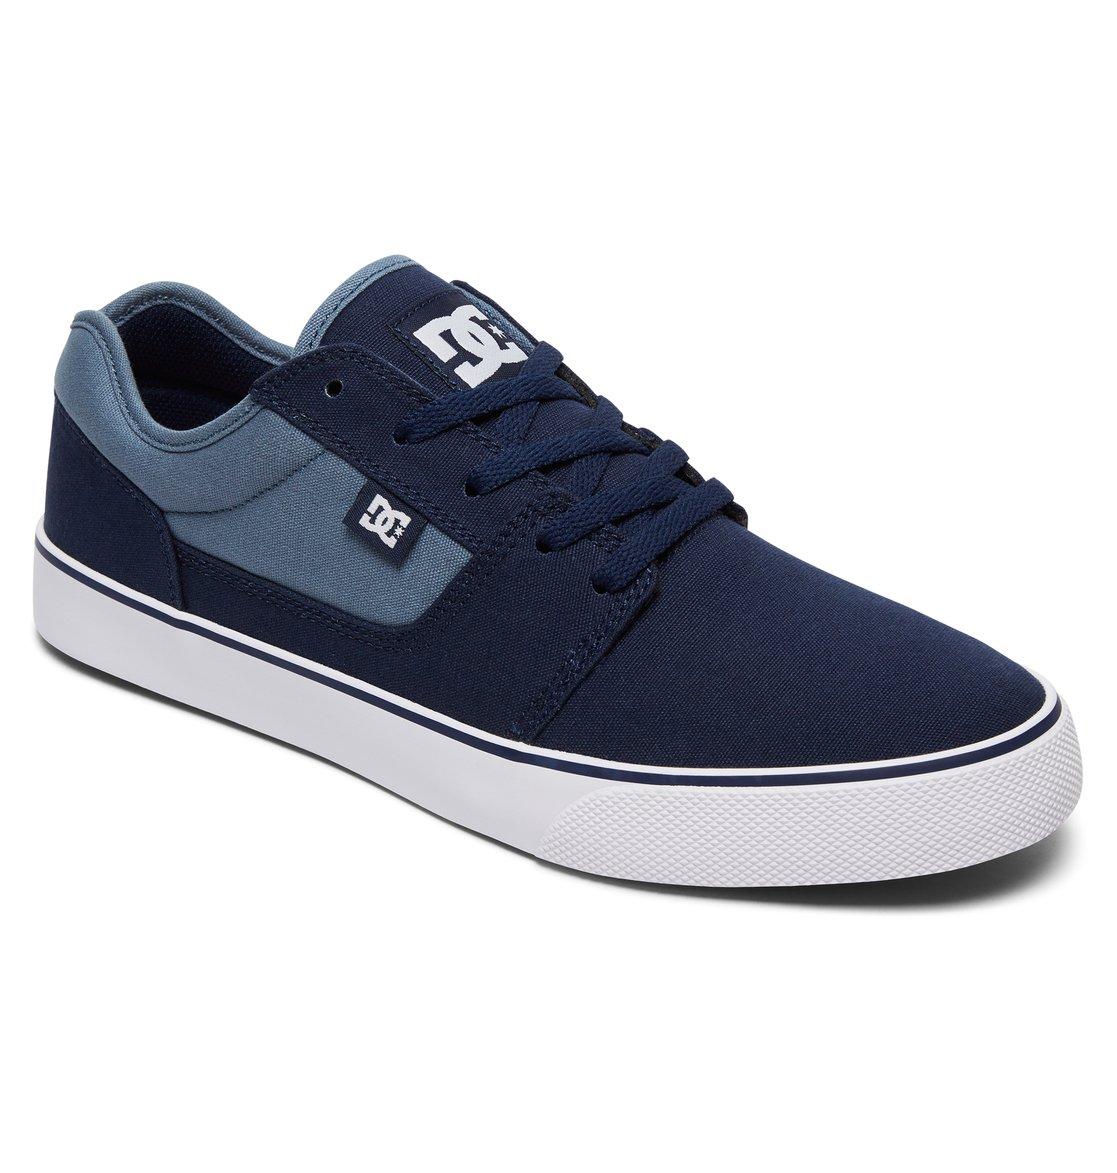 DC Shoes Tonik TX, Zapatillas Para Hombre, Blau (Navy/White Nwh), 45 EU